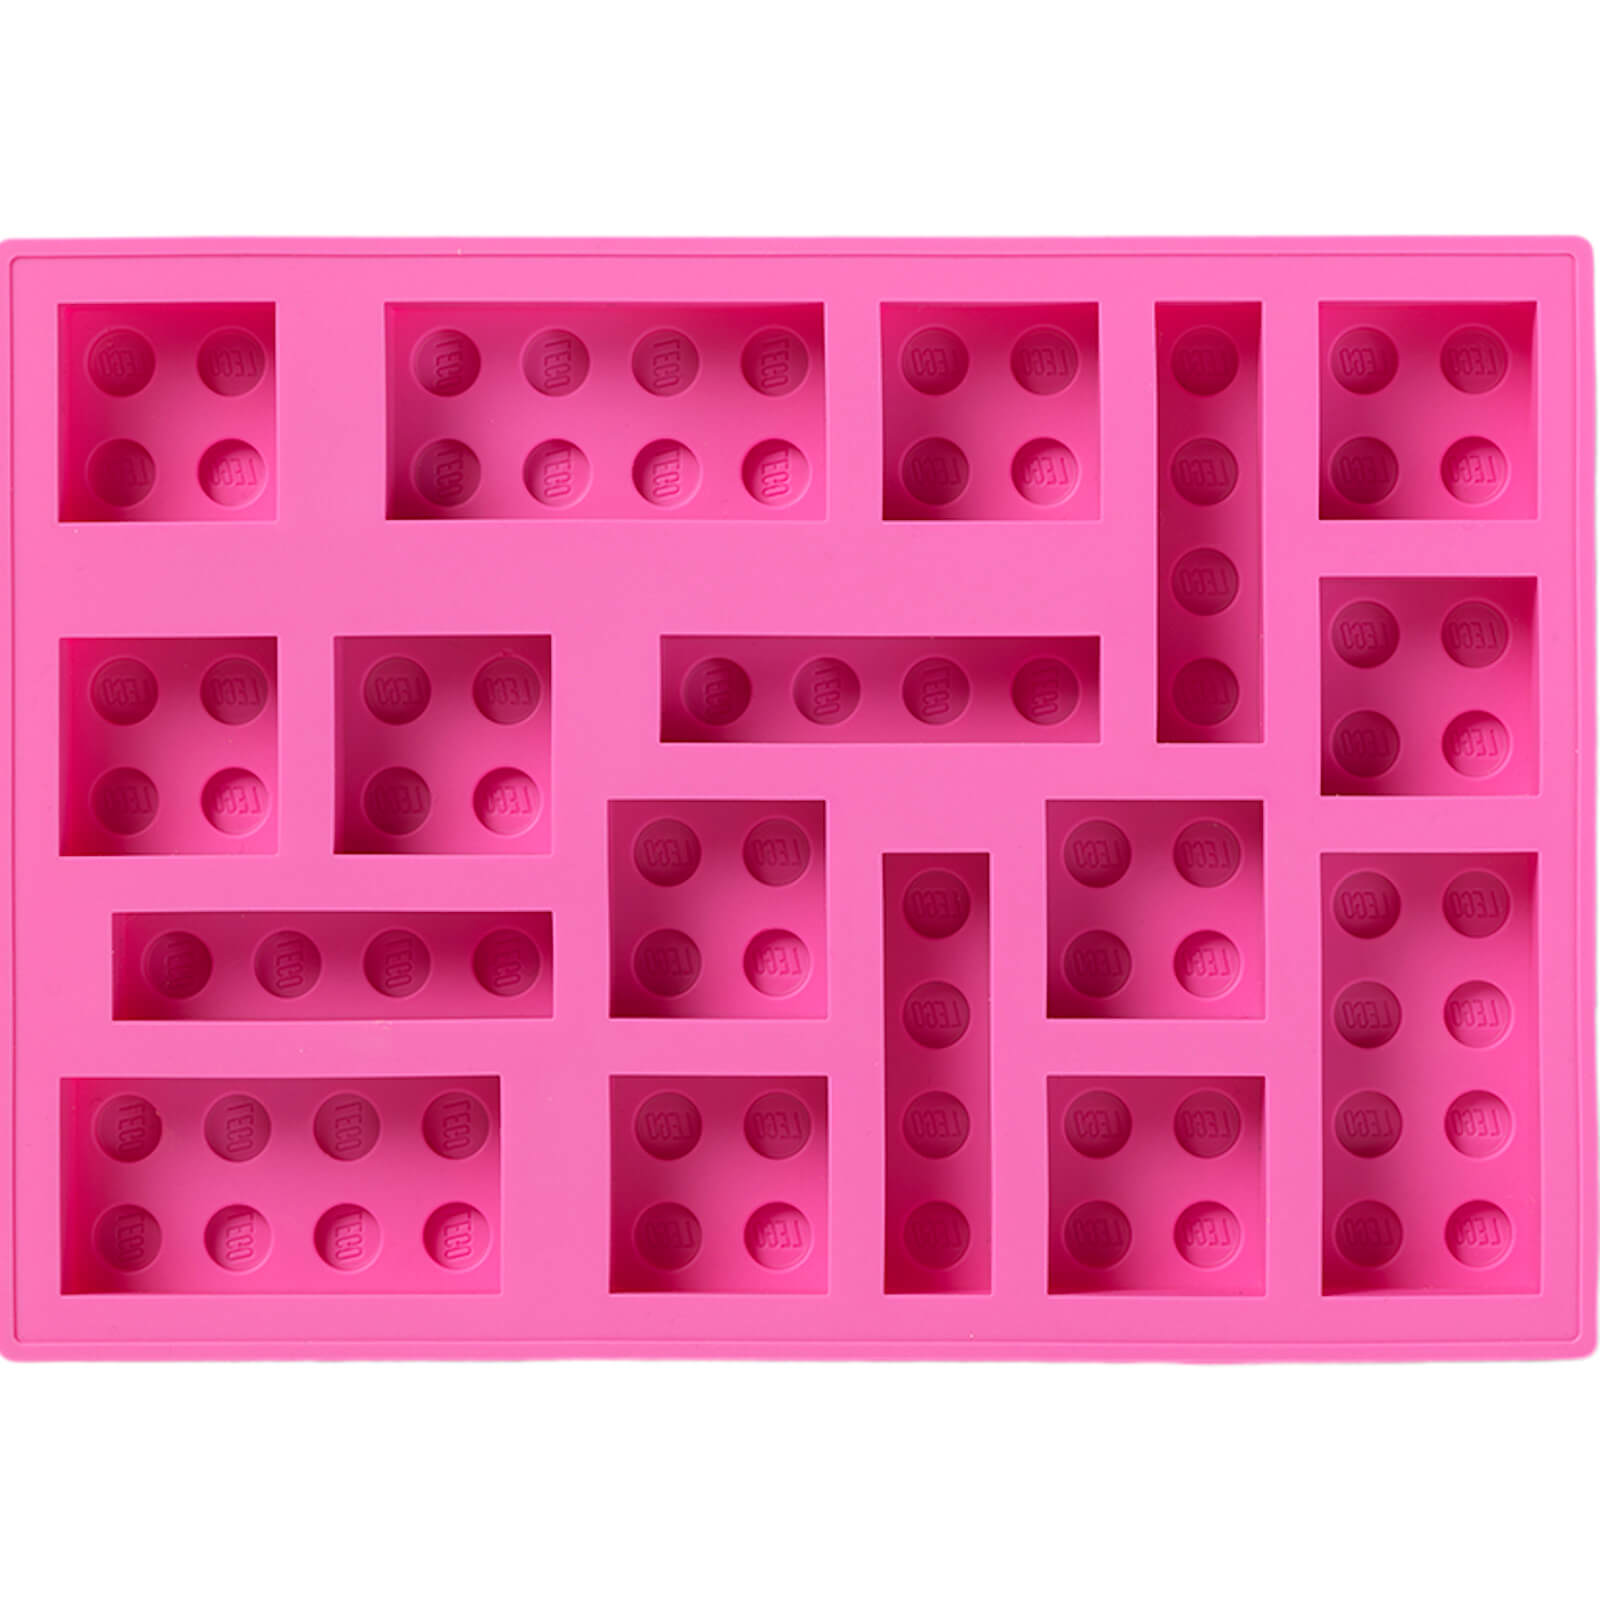 LEGO Ice Cube Tray   Pink